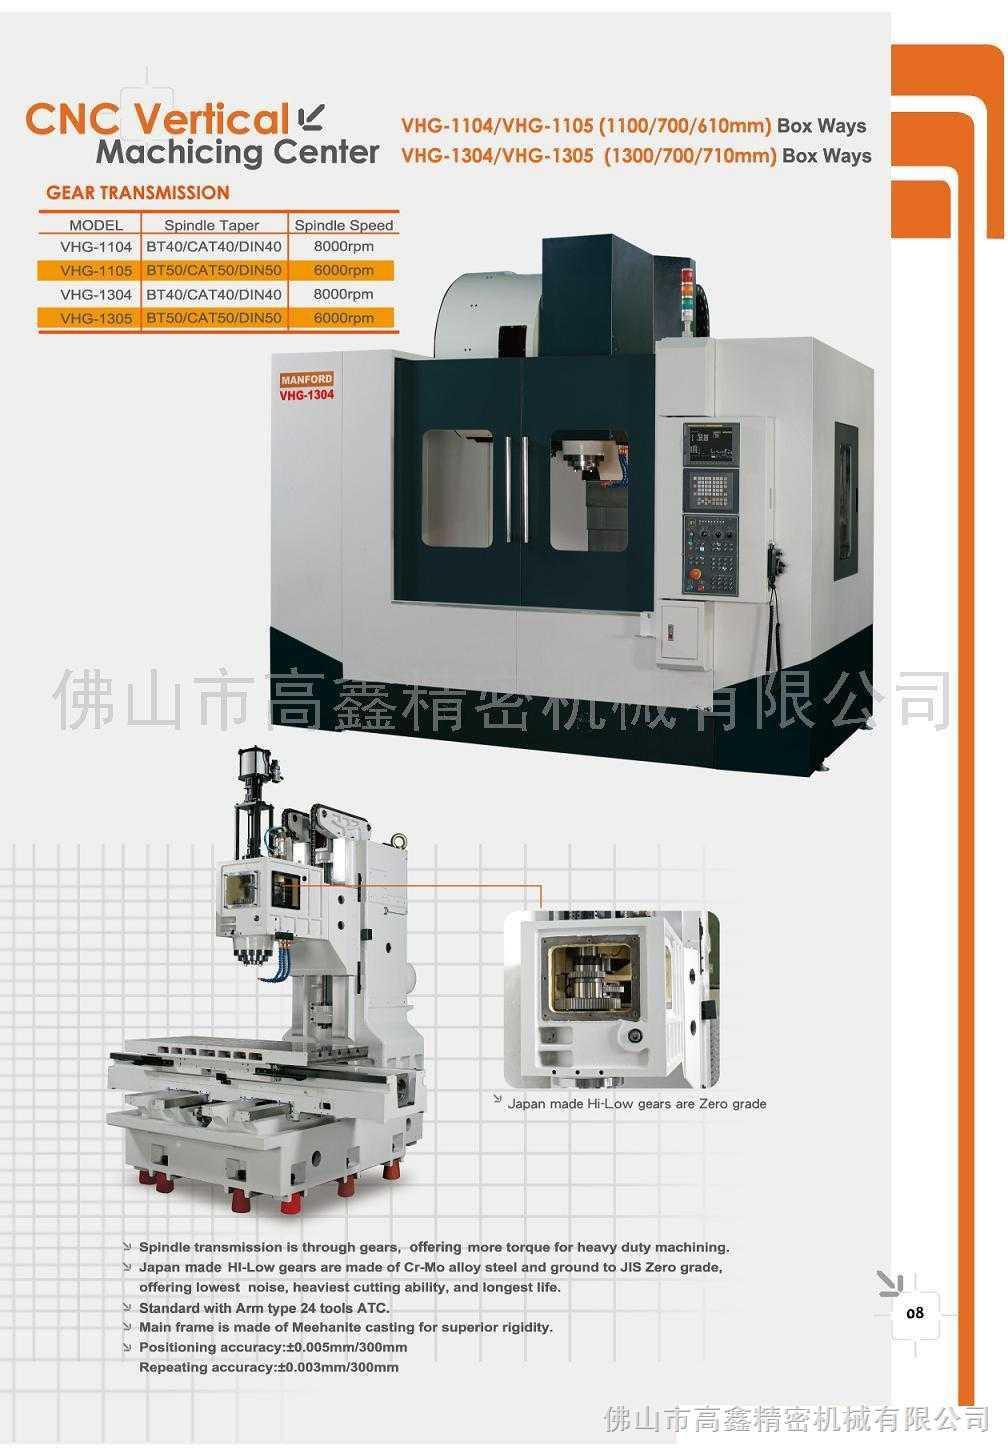 迈鑫MANFORD VHG-1304/VHG-1305立式加工中心